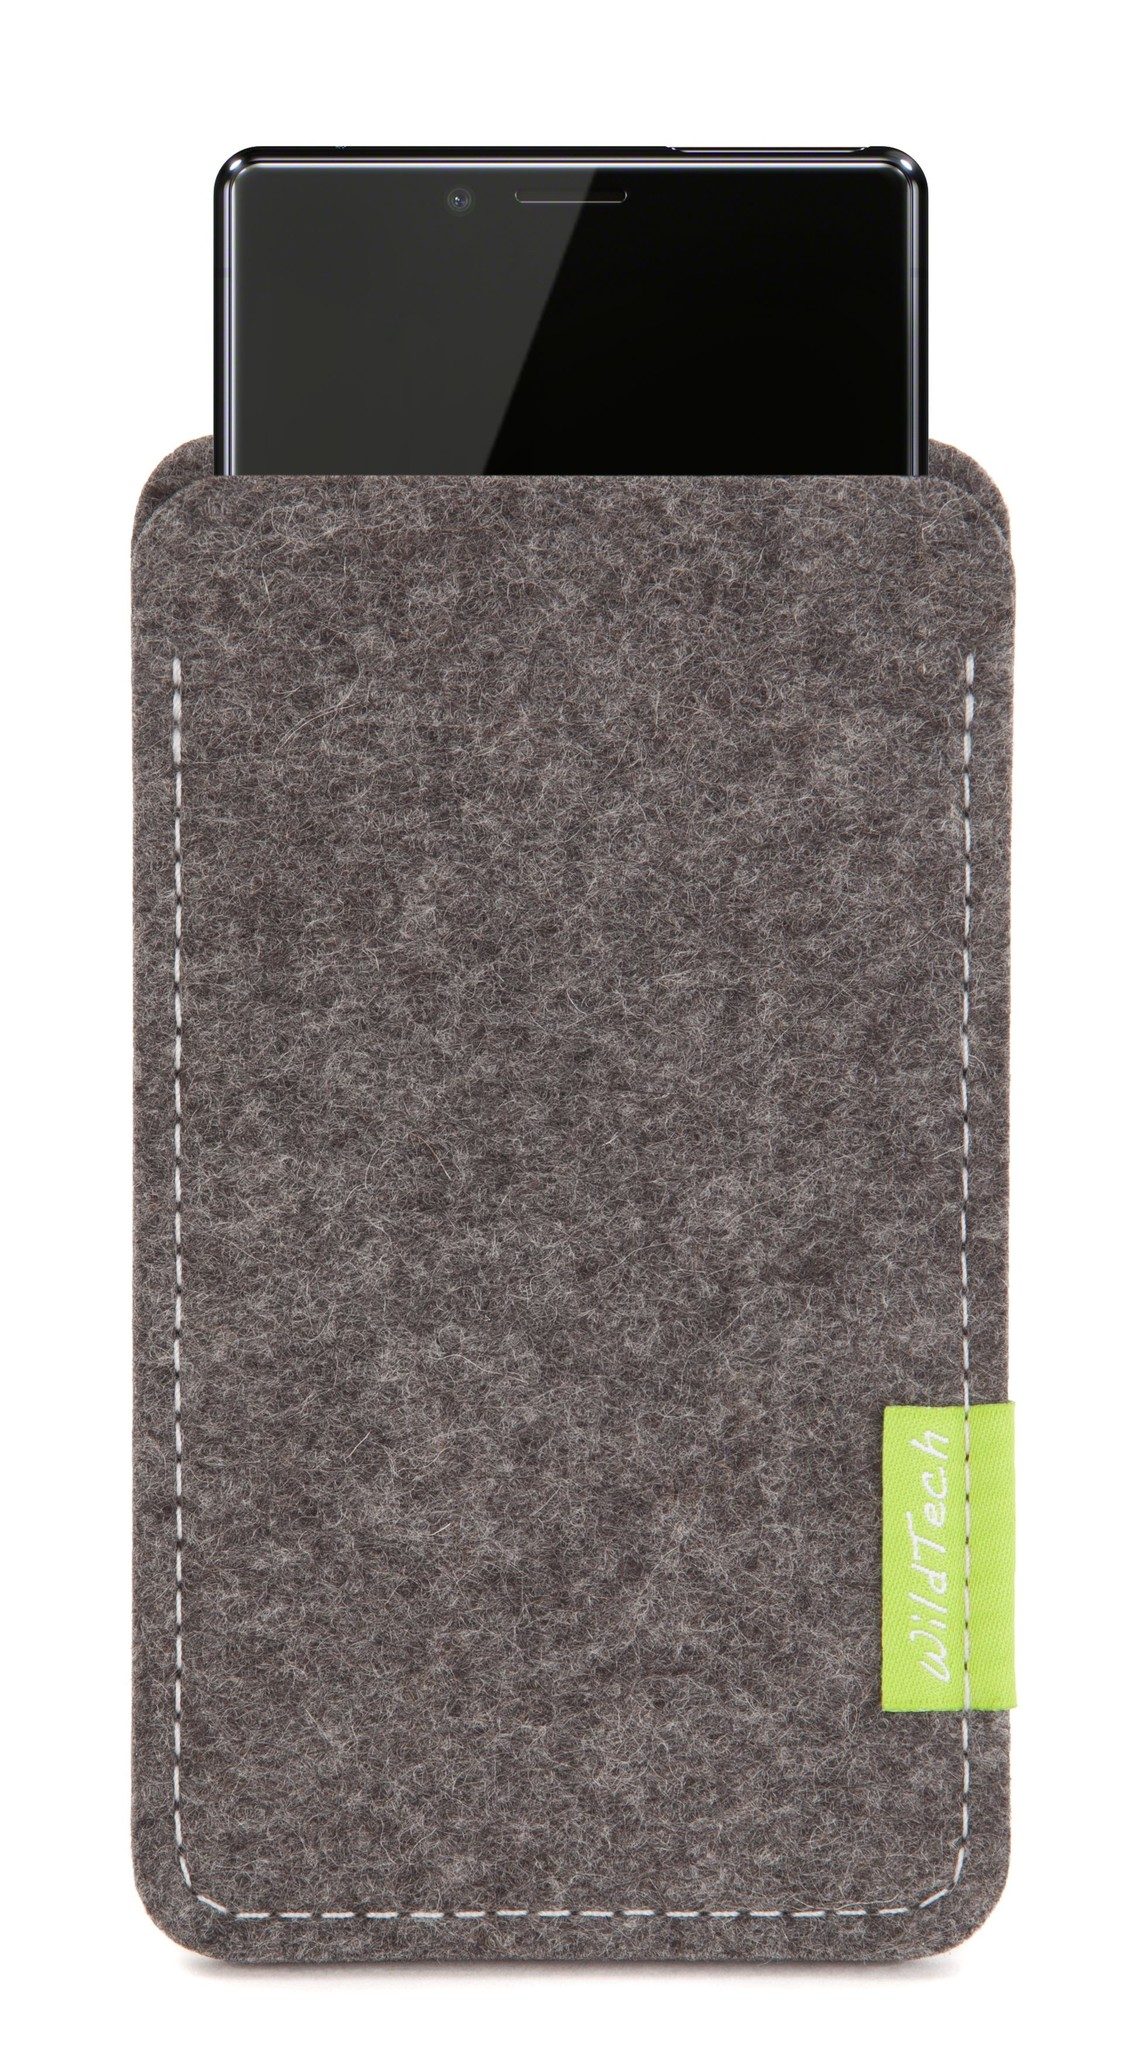 Xperia Sleeve Grau-1